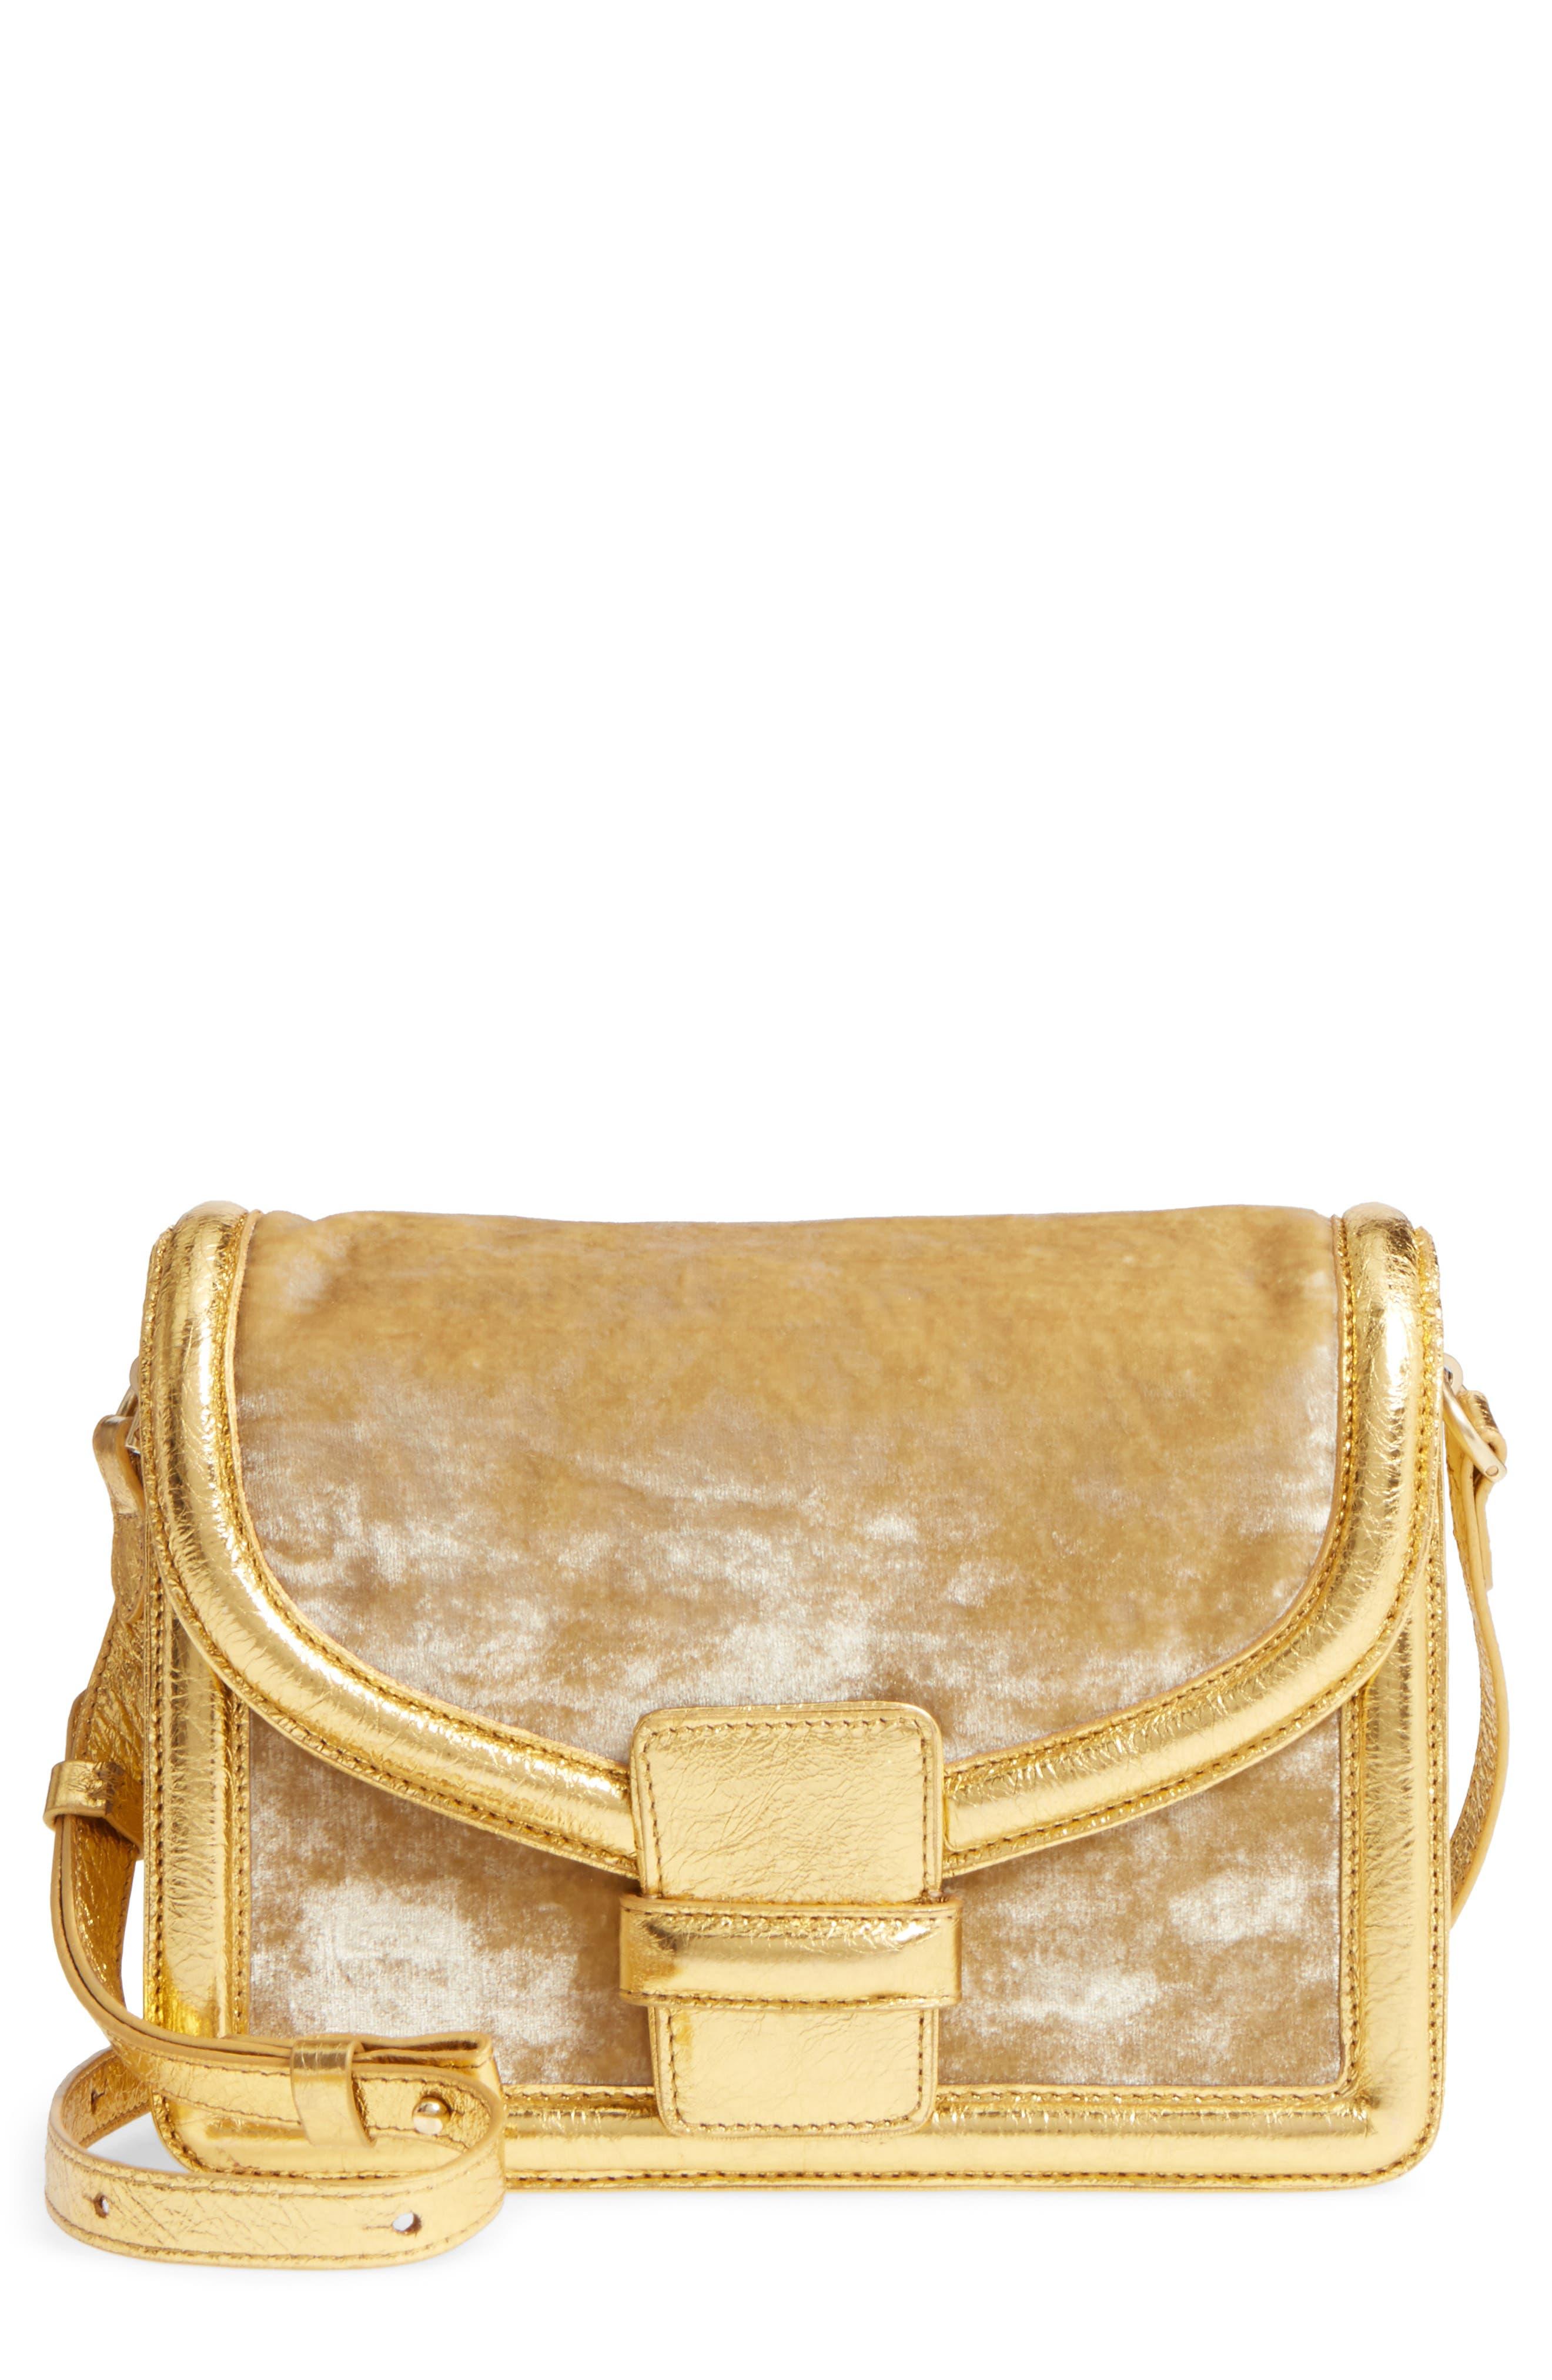 Alternate Image 1 Selected - Dries Van Noten Velvet & Metallic Leather Crossbody Bag